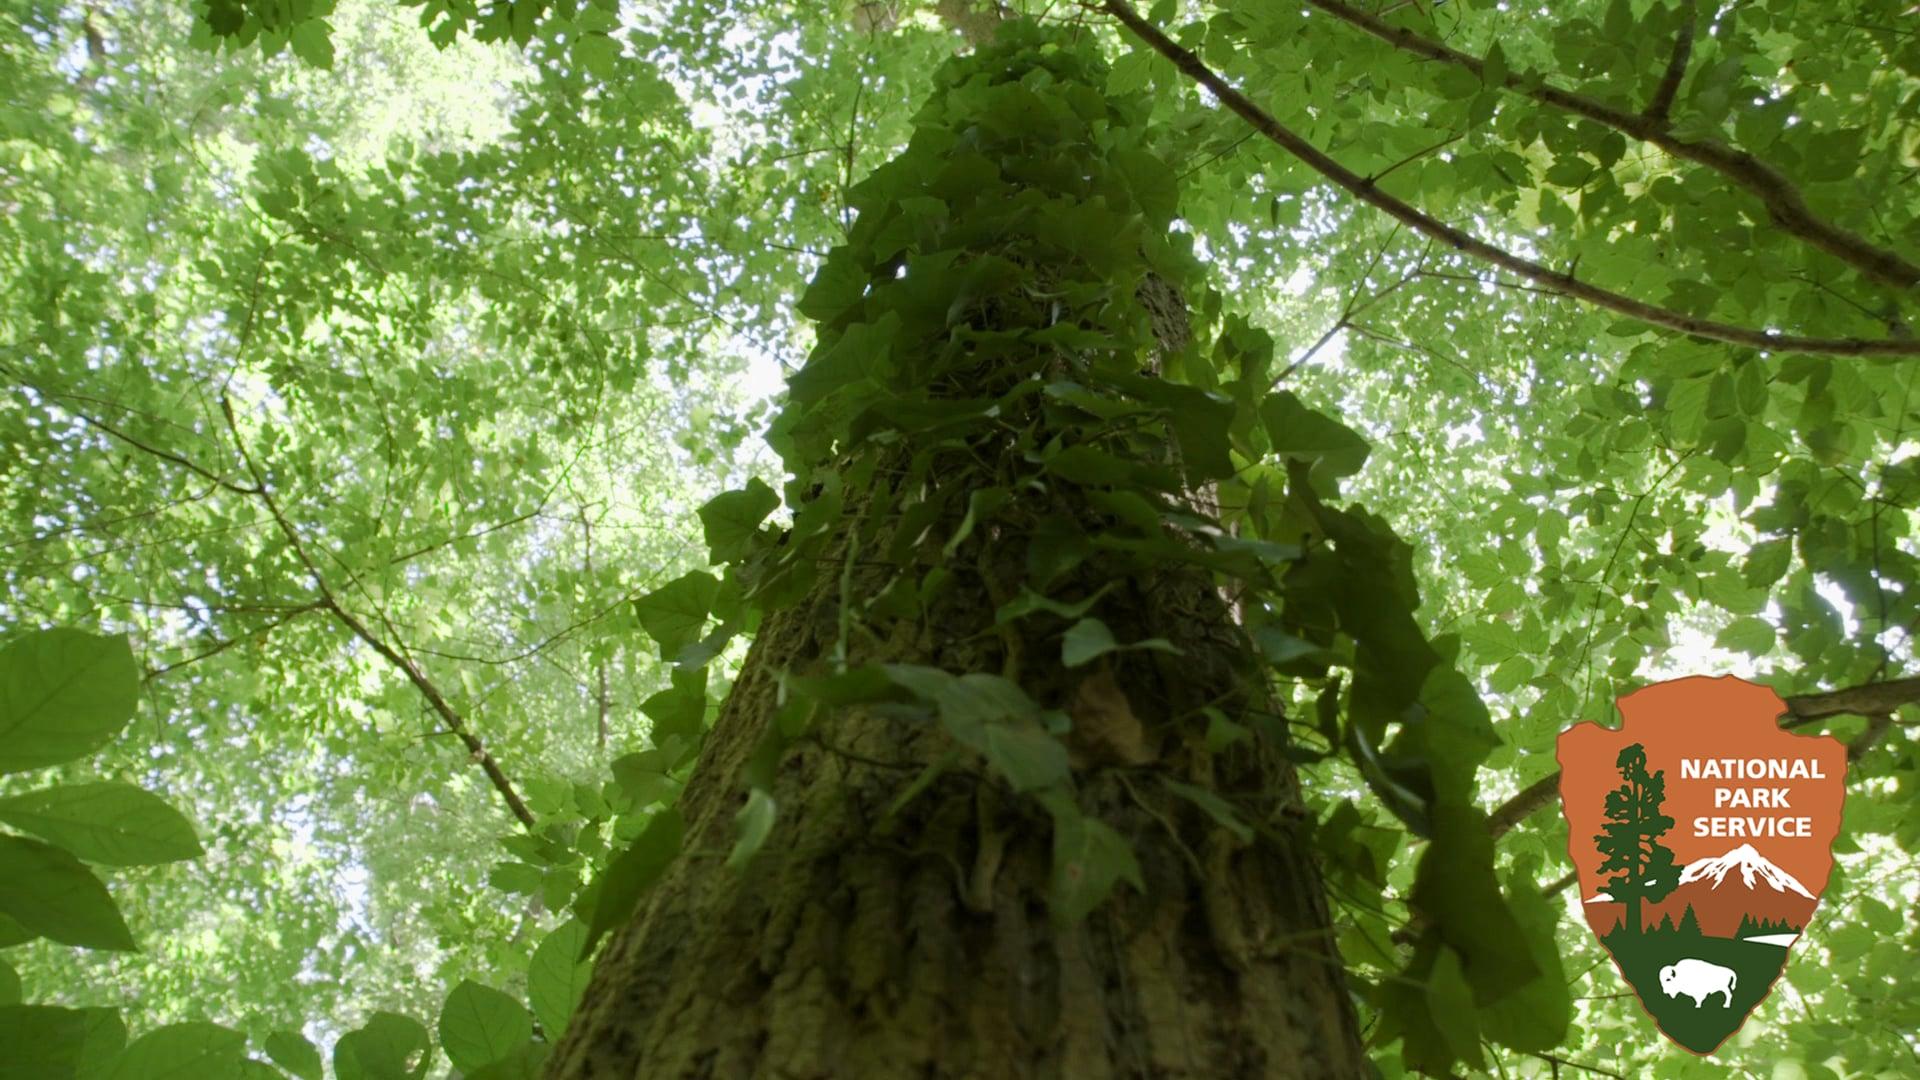 Invasive Plants: Community Stewardship for a Healthy Park